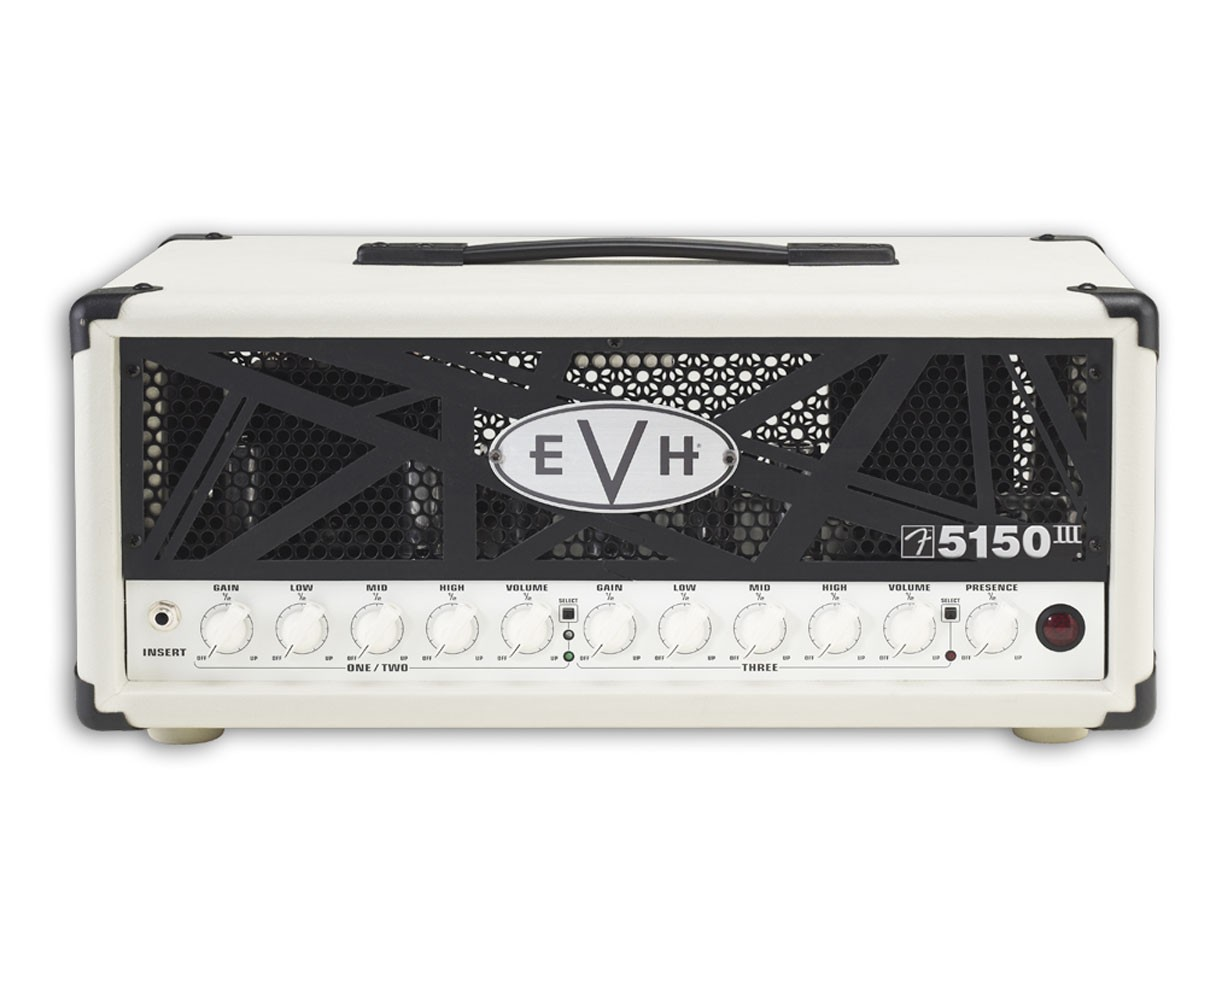 EVH 5150 III 50W Ivory 120V - PRICE REDUCED!!!